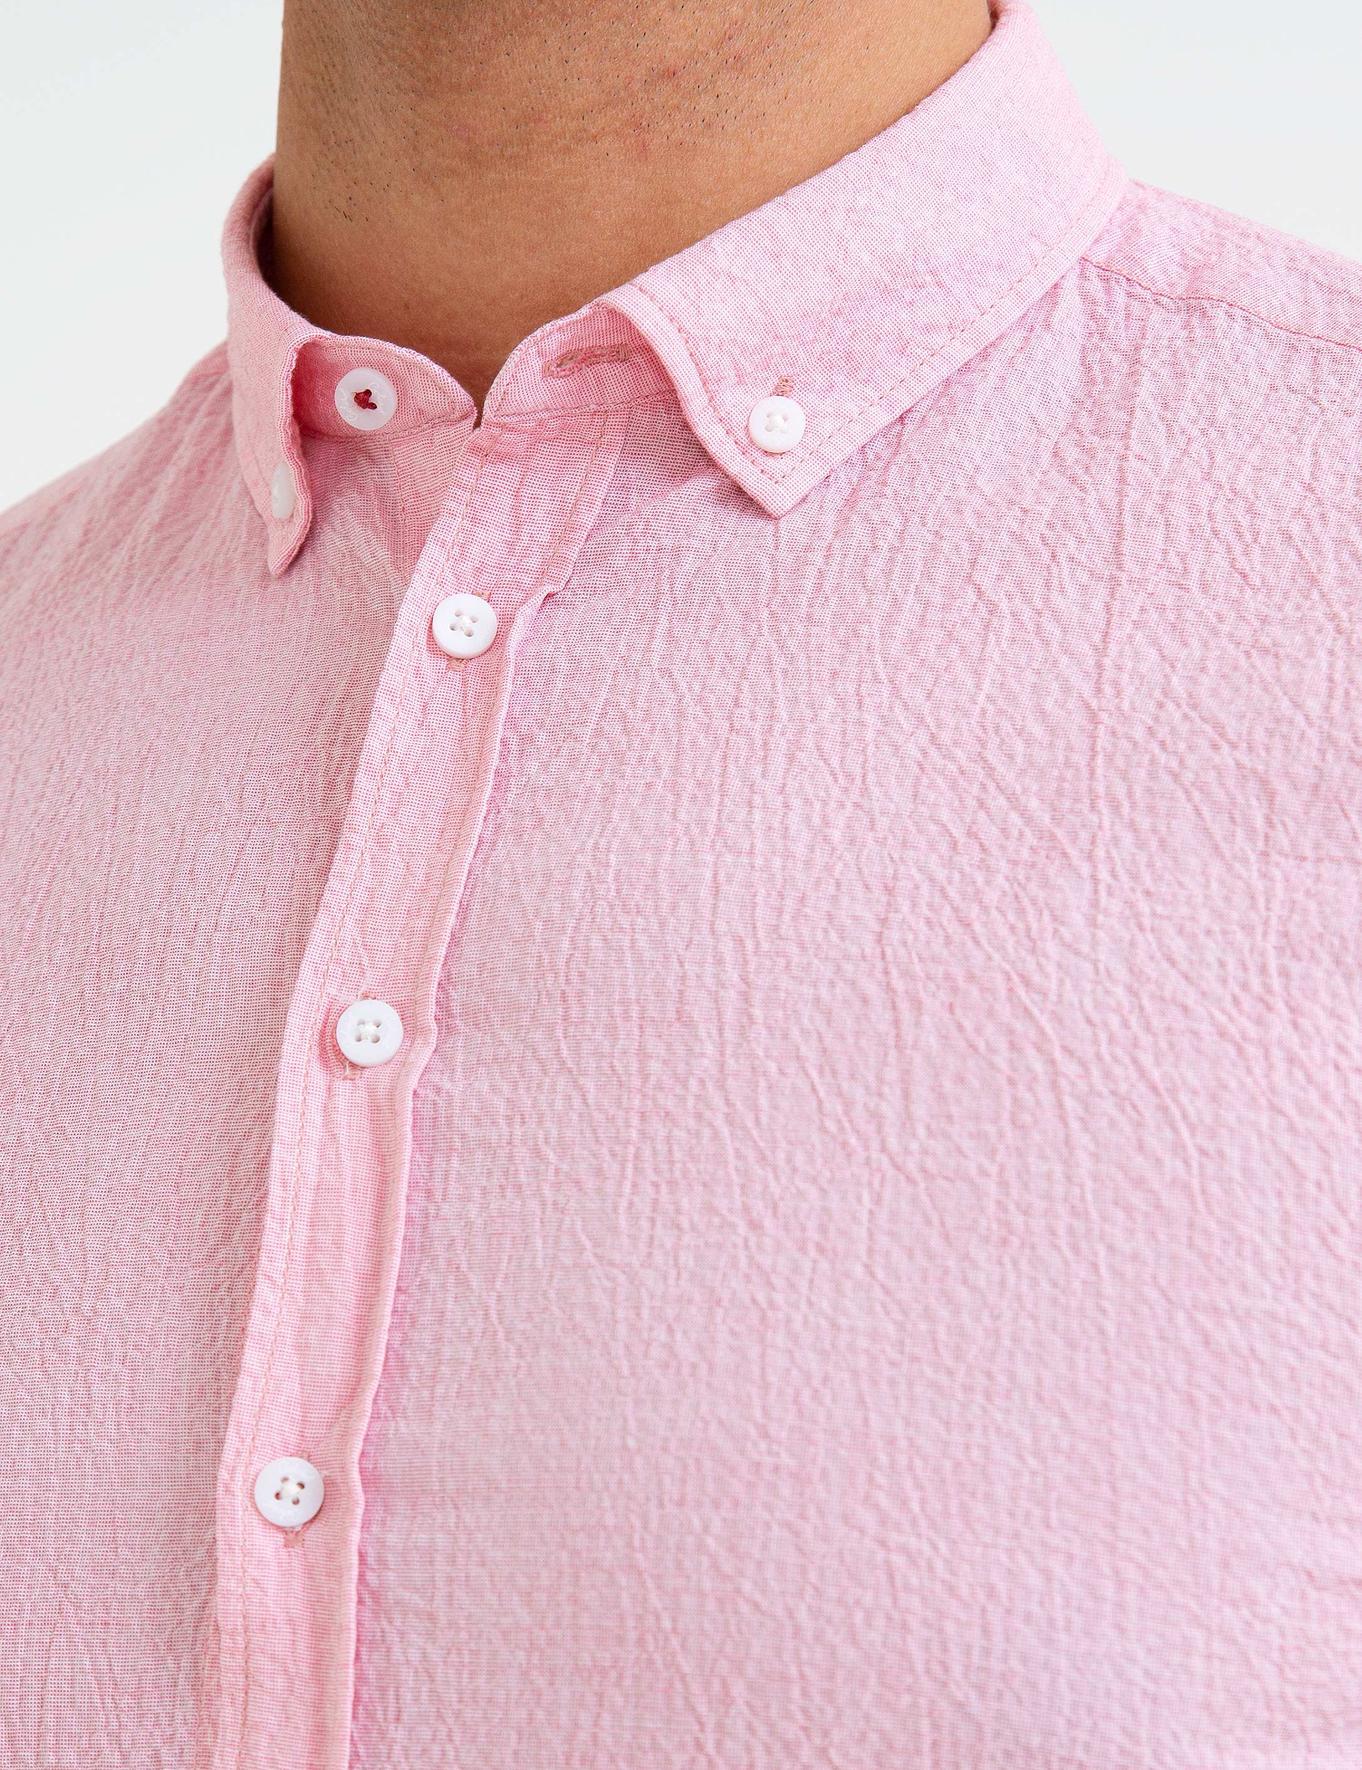 Kırmızı Slim Fit Gömlek - 50186064004